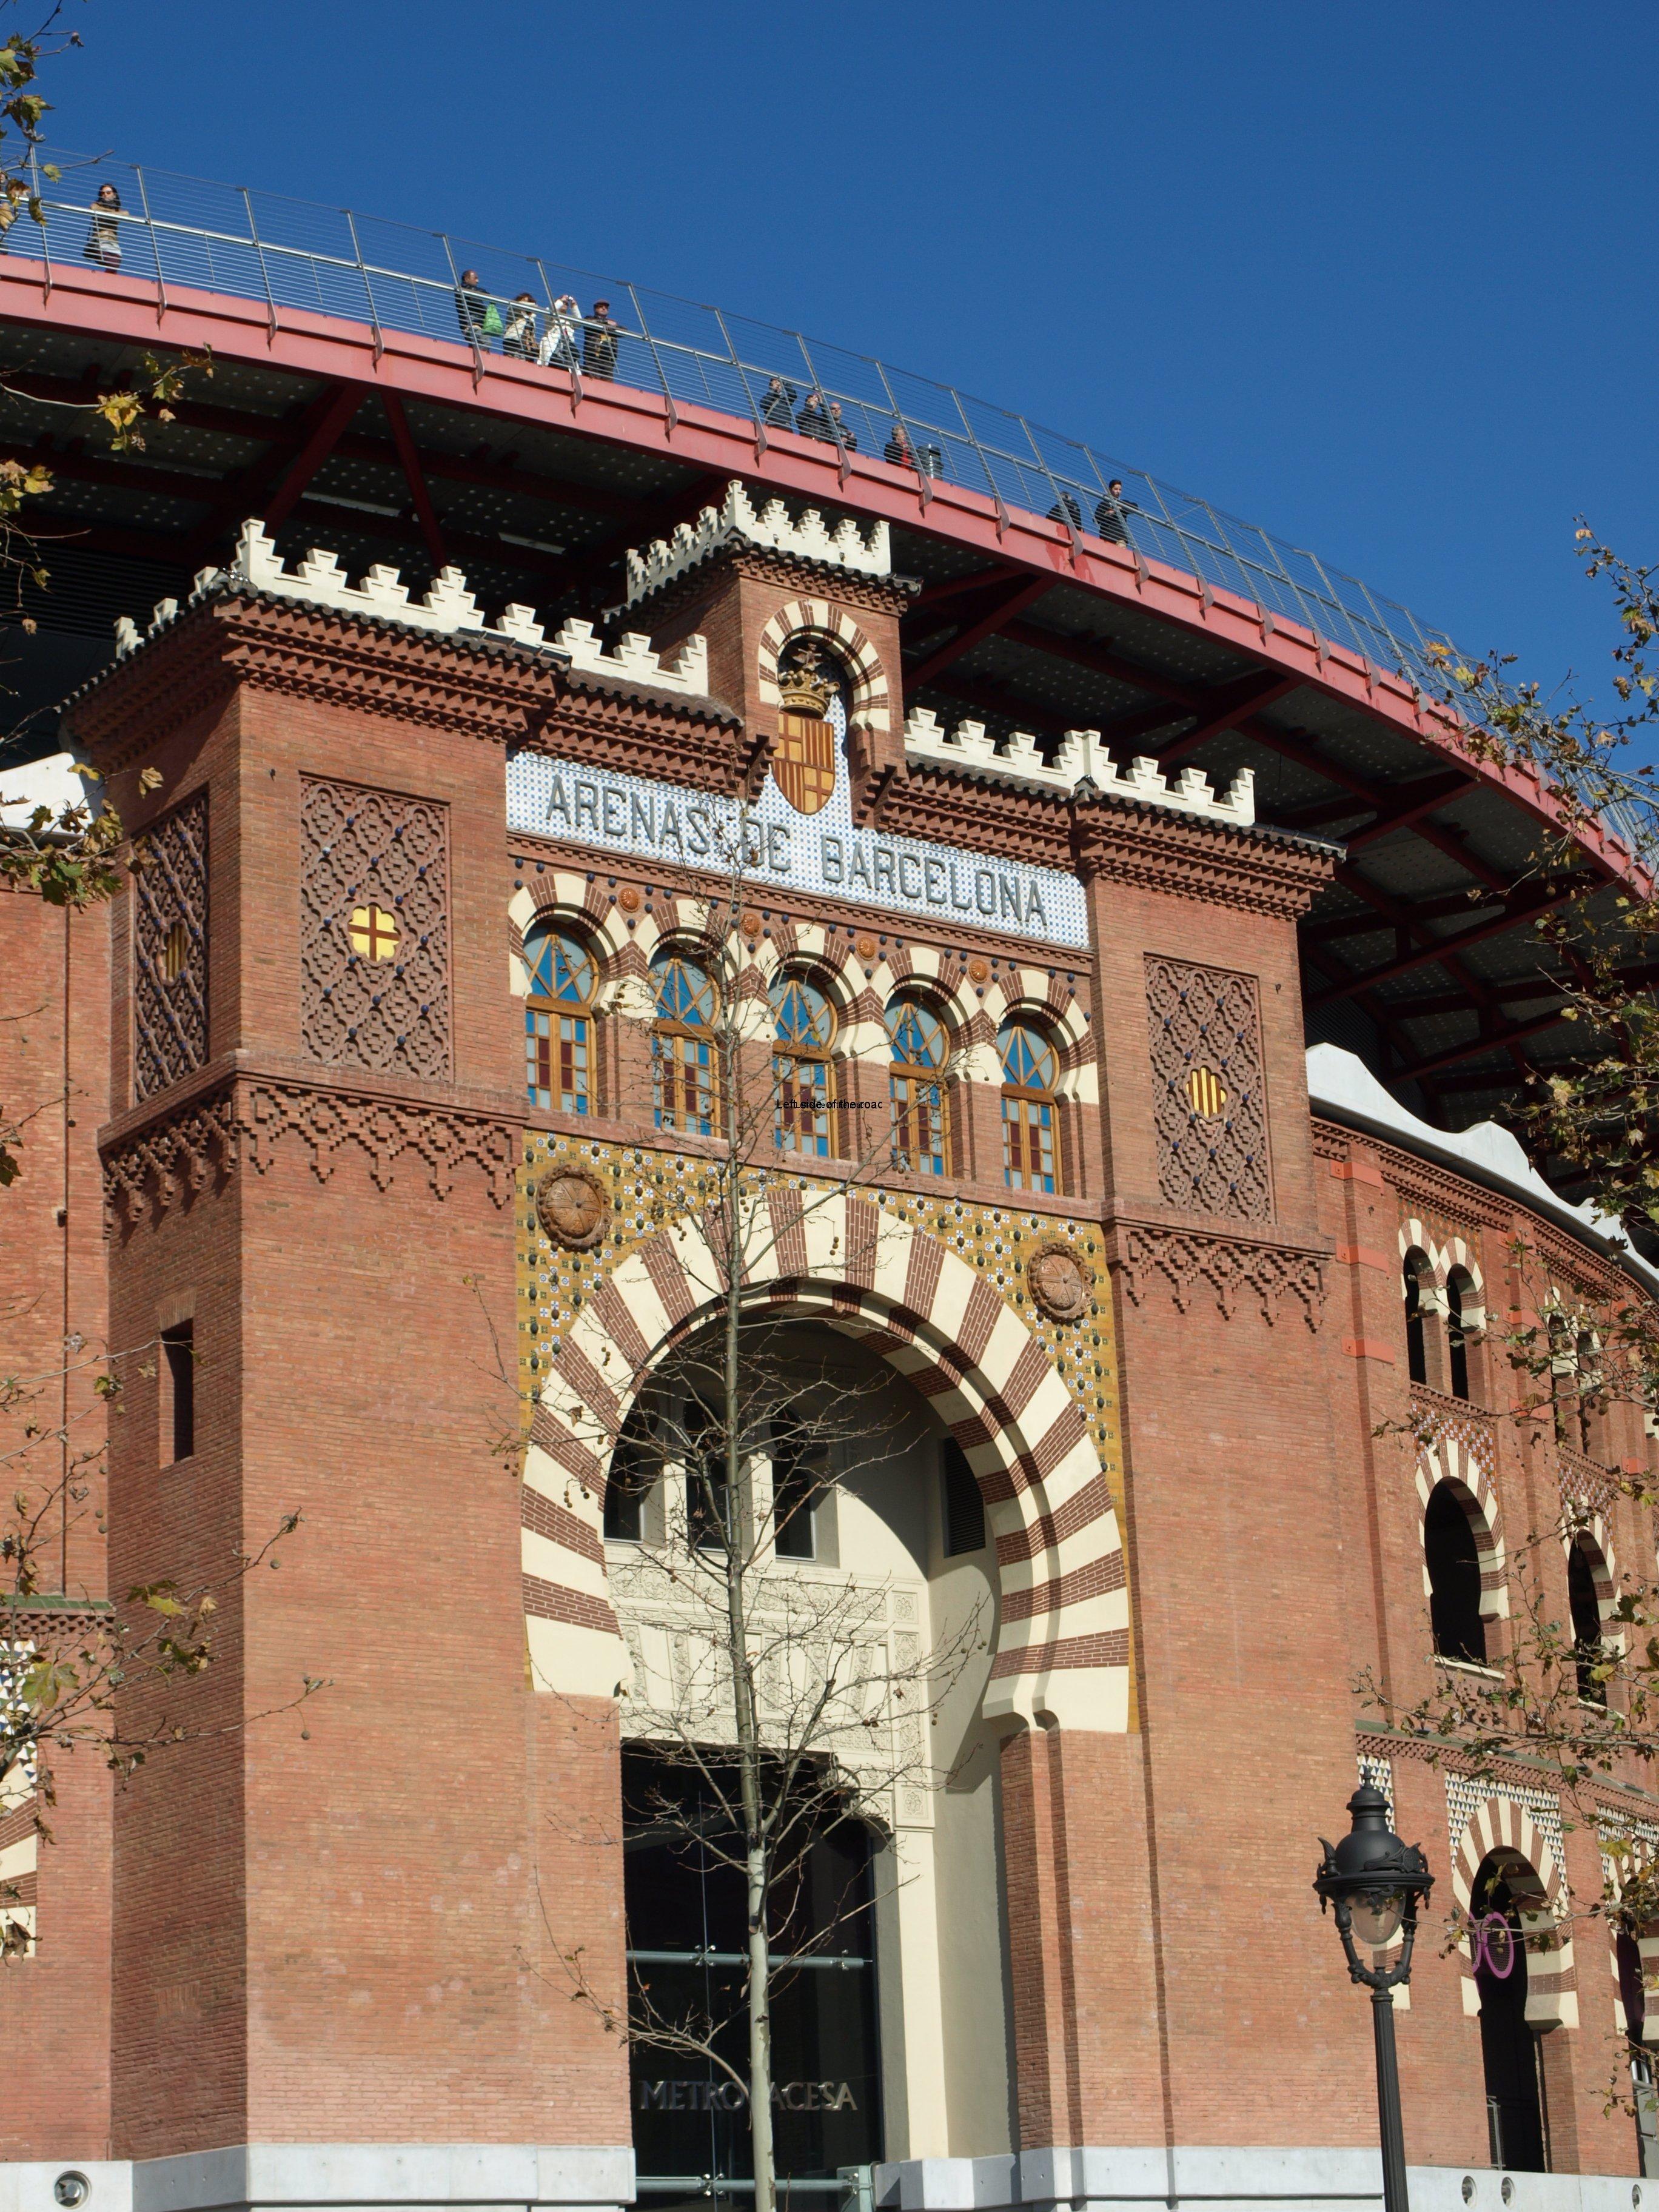 Arenas Bull Ring - Placa de Espanya - Barcelona